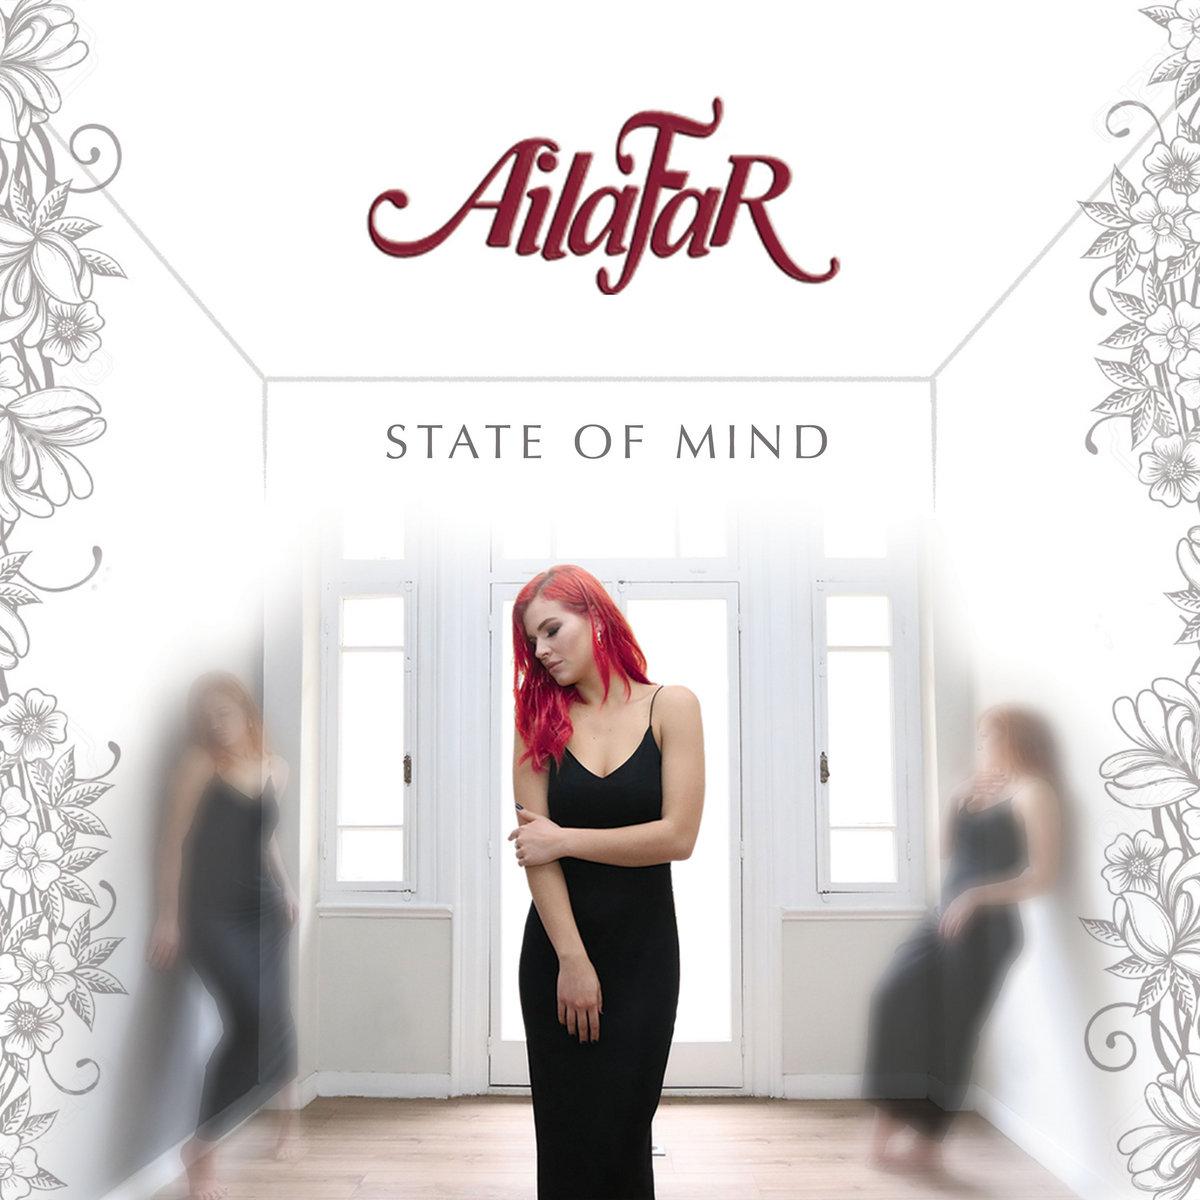 ailafar-state of mind